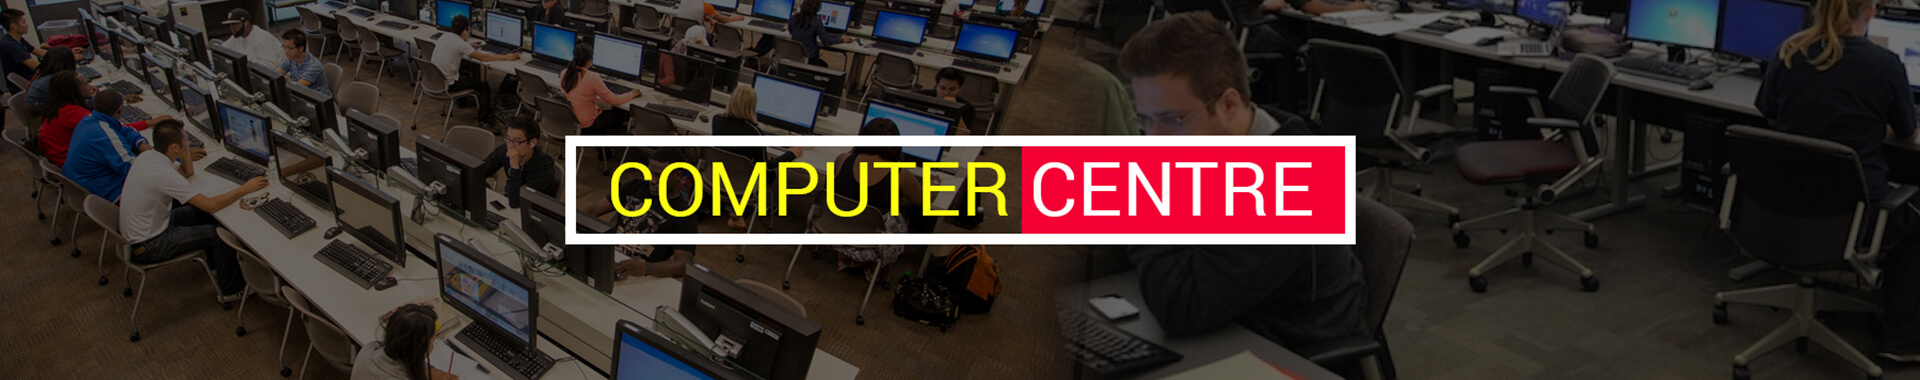 Apna Sambhal Computer Centers List